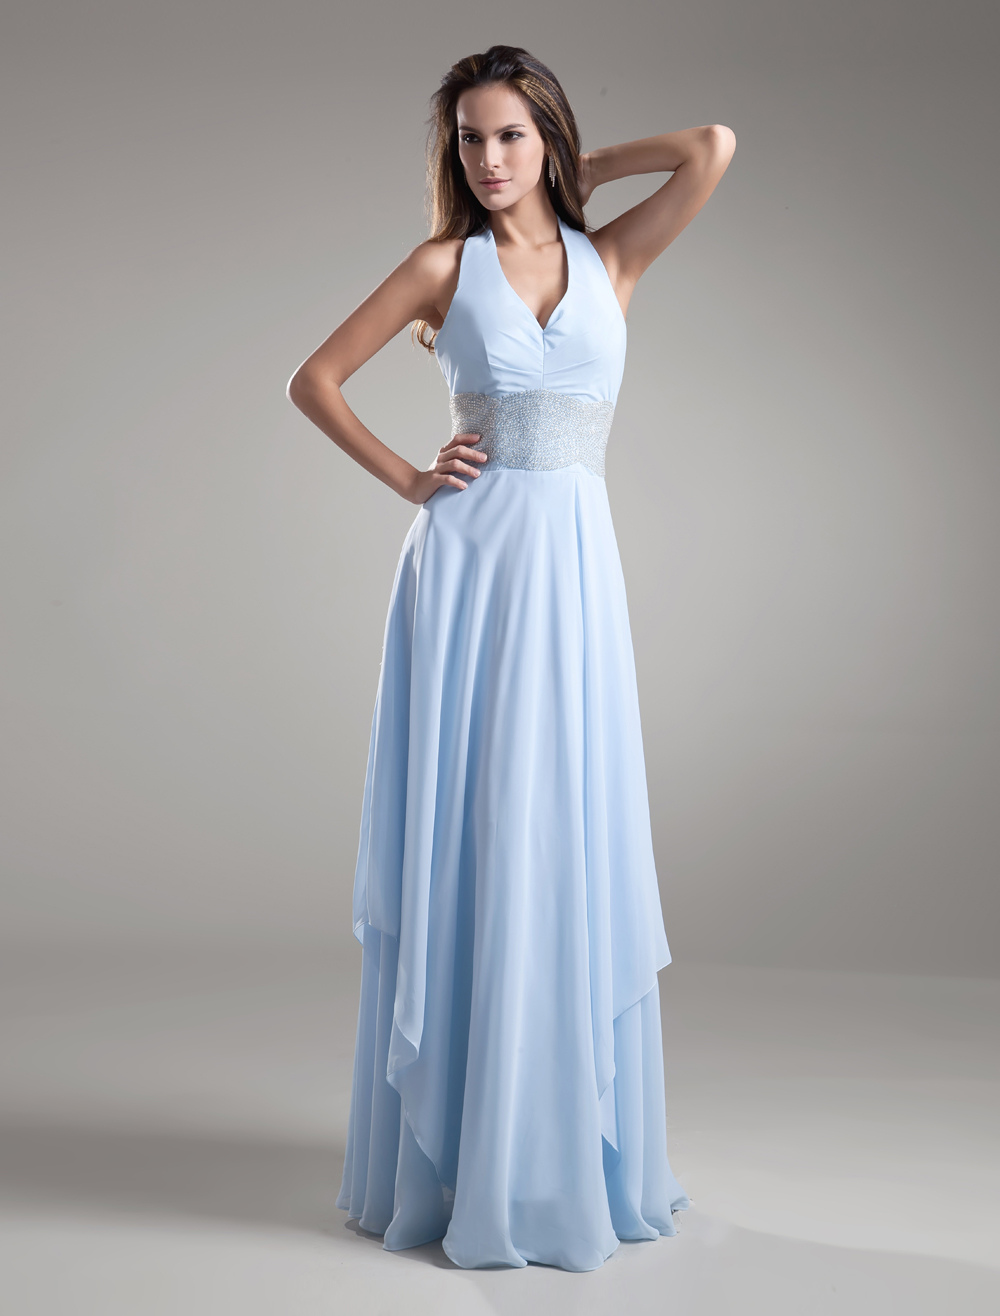 Robe bleu ciel soiree les tendances de la mode fran aise for Robes de mariage bleu ciel